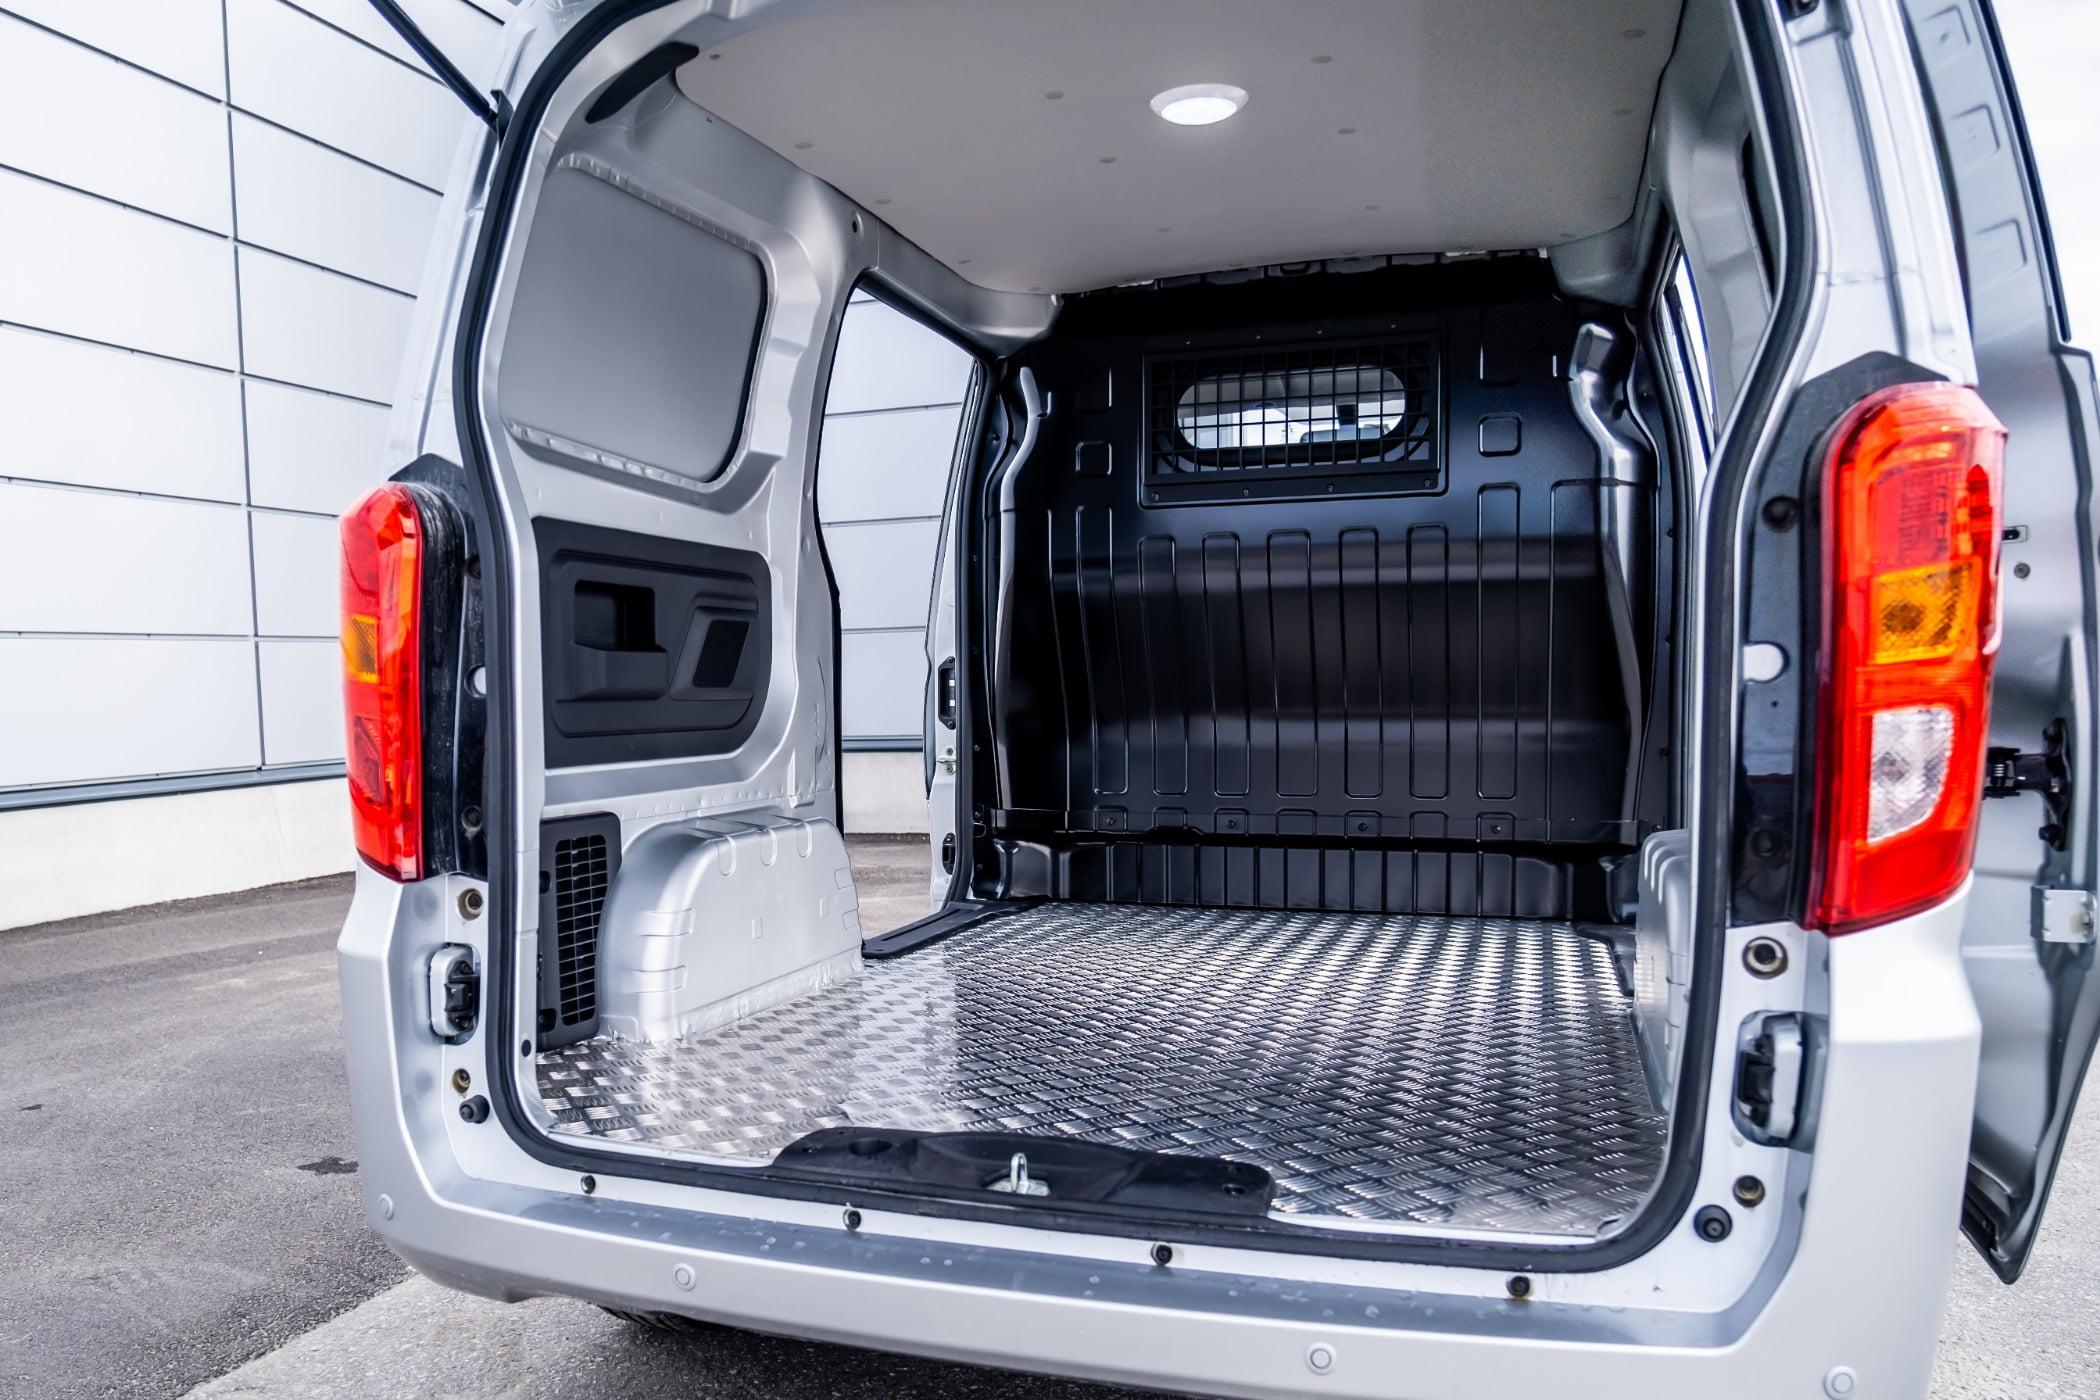 Automotive tail  brake light, Land vehicle, Car, Tire, Van